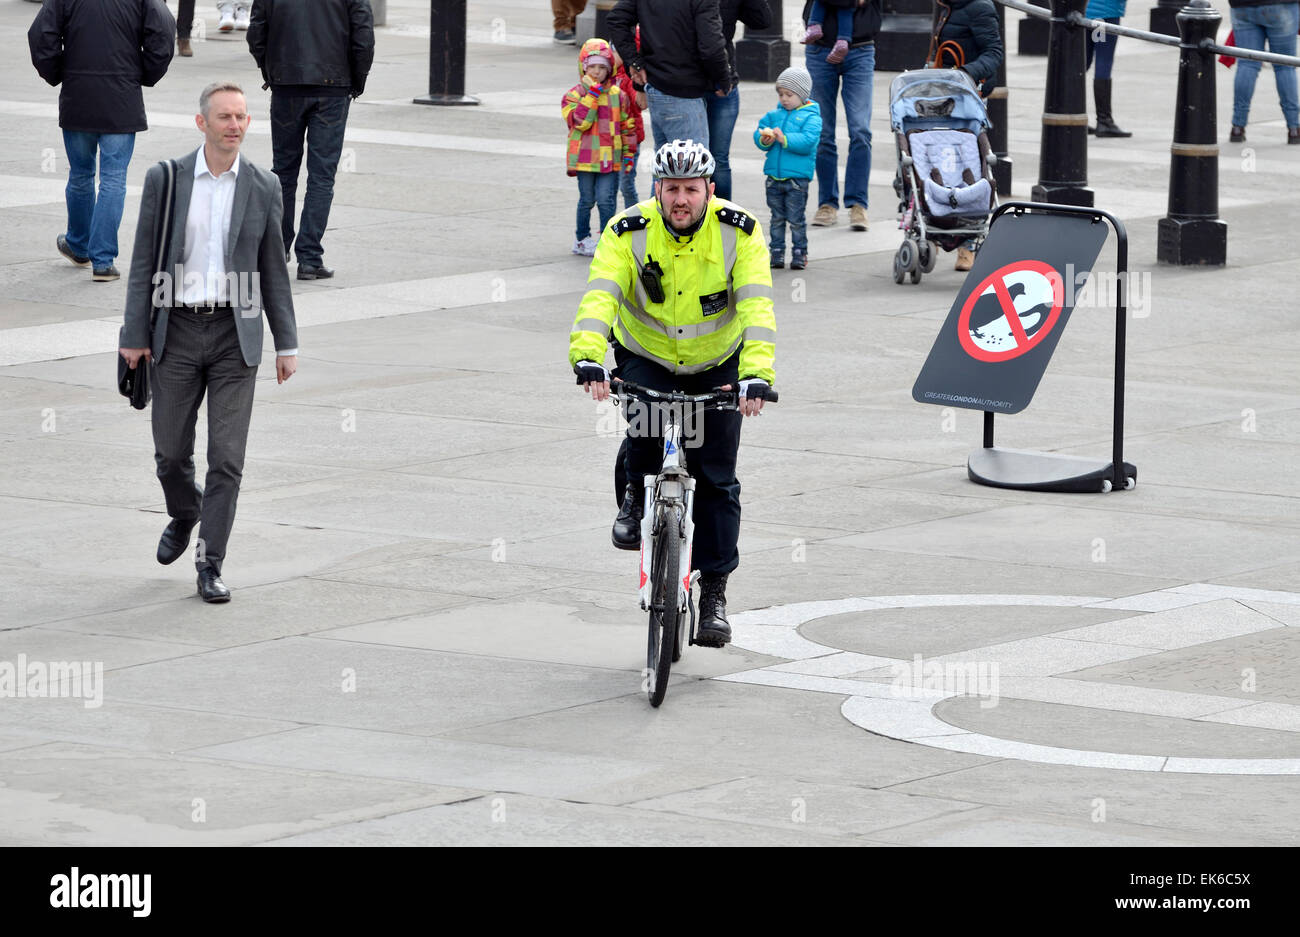 London, England, UK. Metropolitan police officer on a bicycle in Trafalgar Square - Stock Image